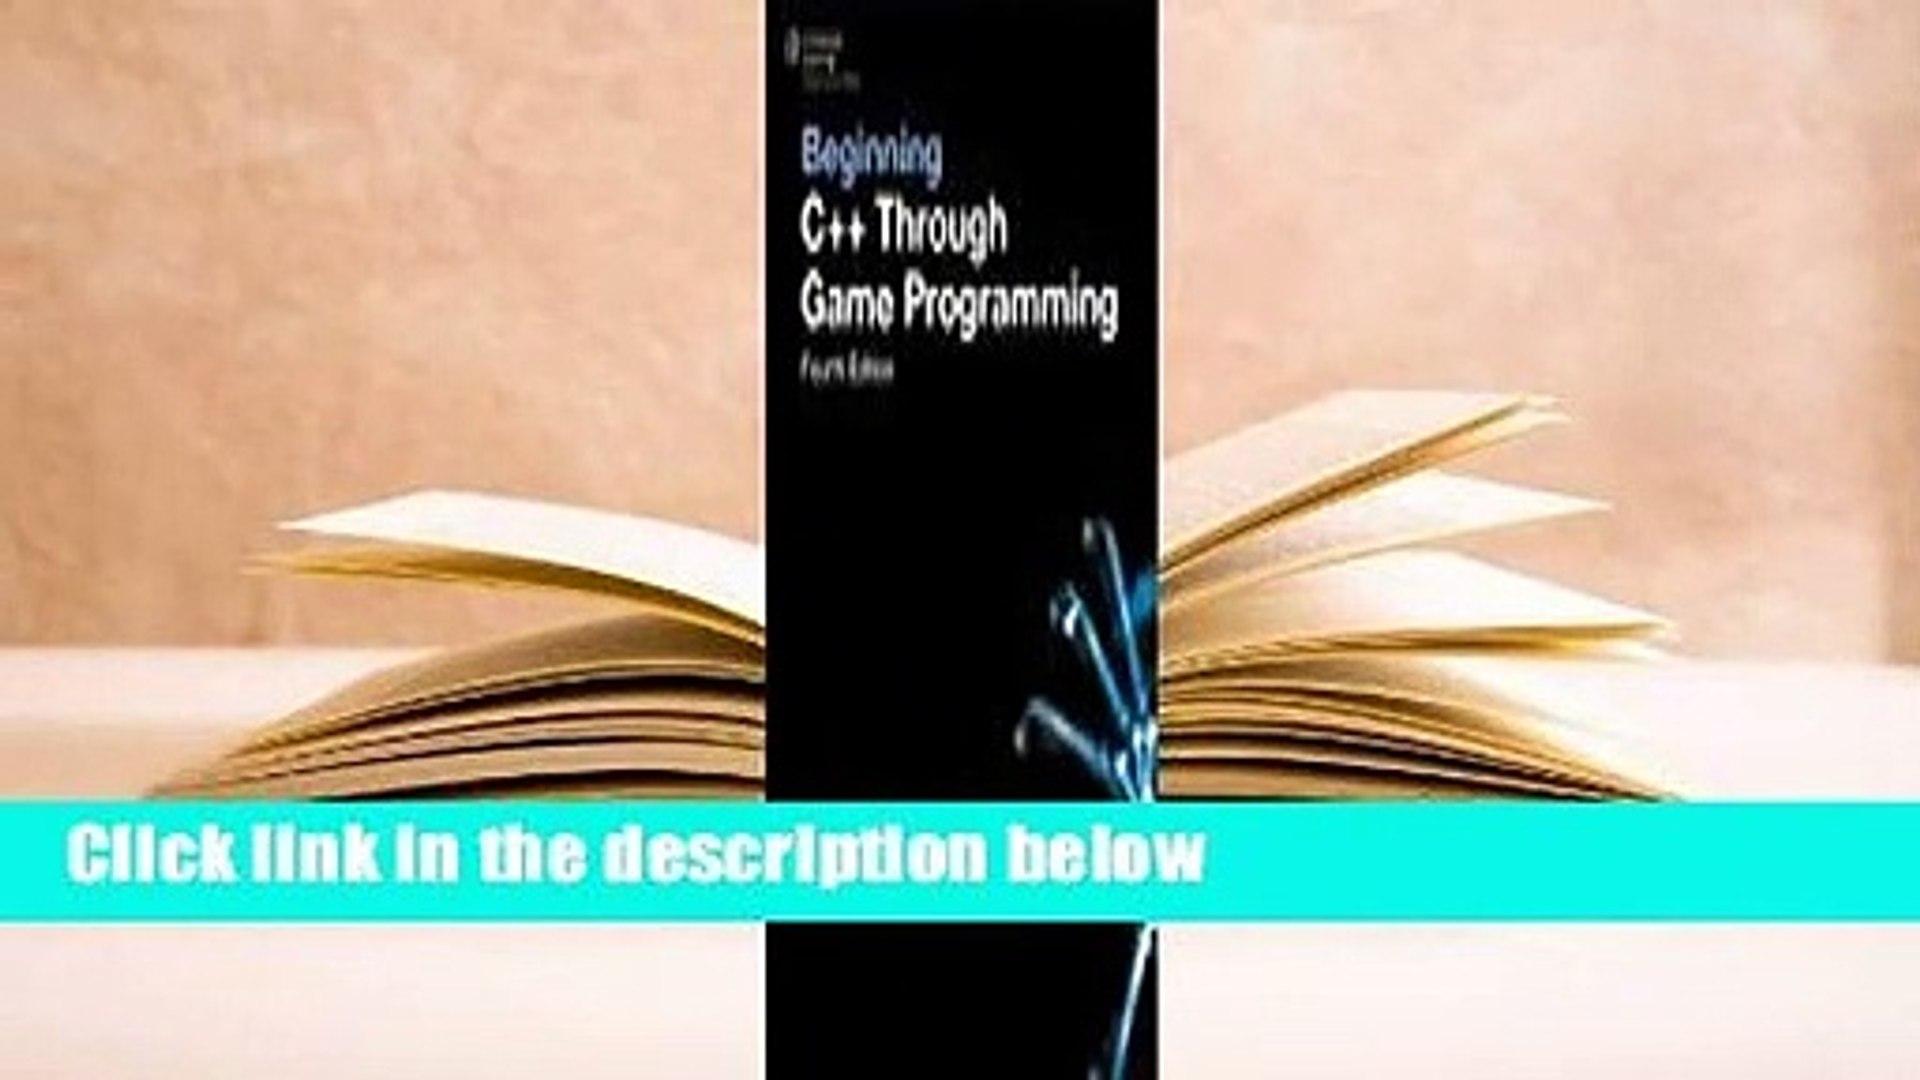 Beginning C+ Second Edition Through Game Programming